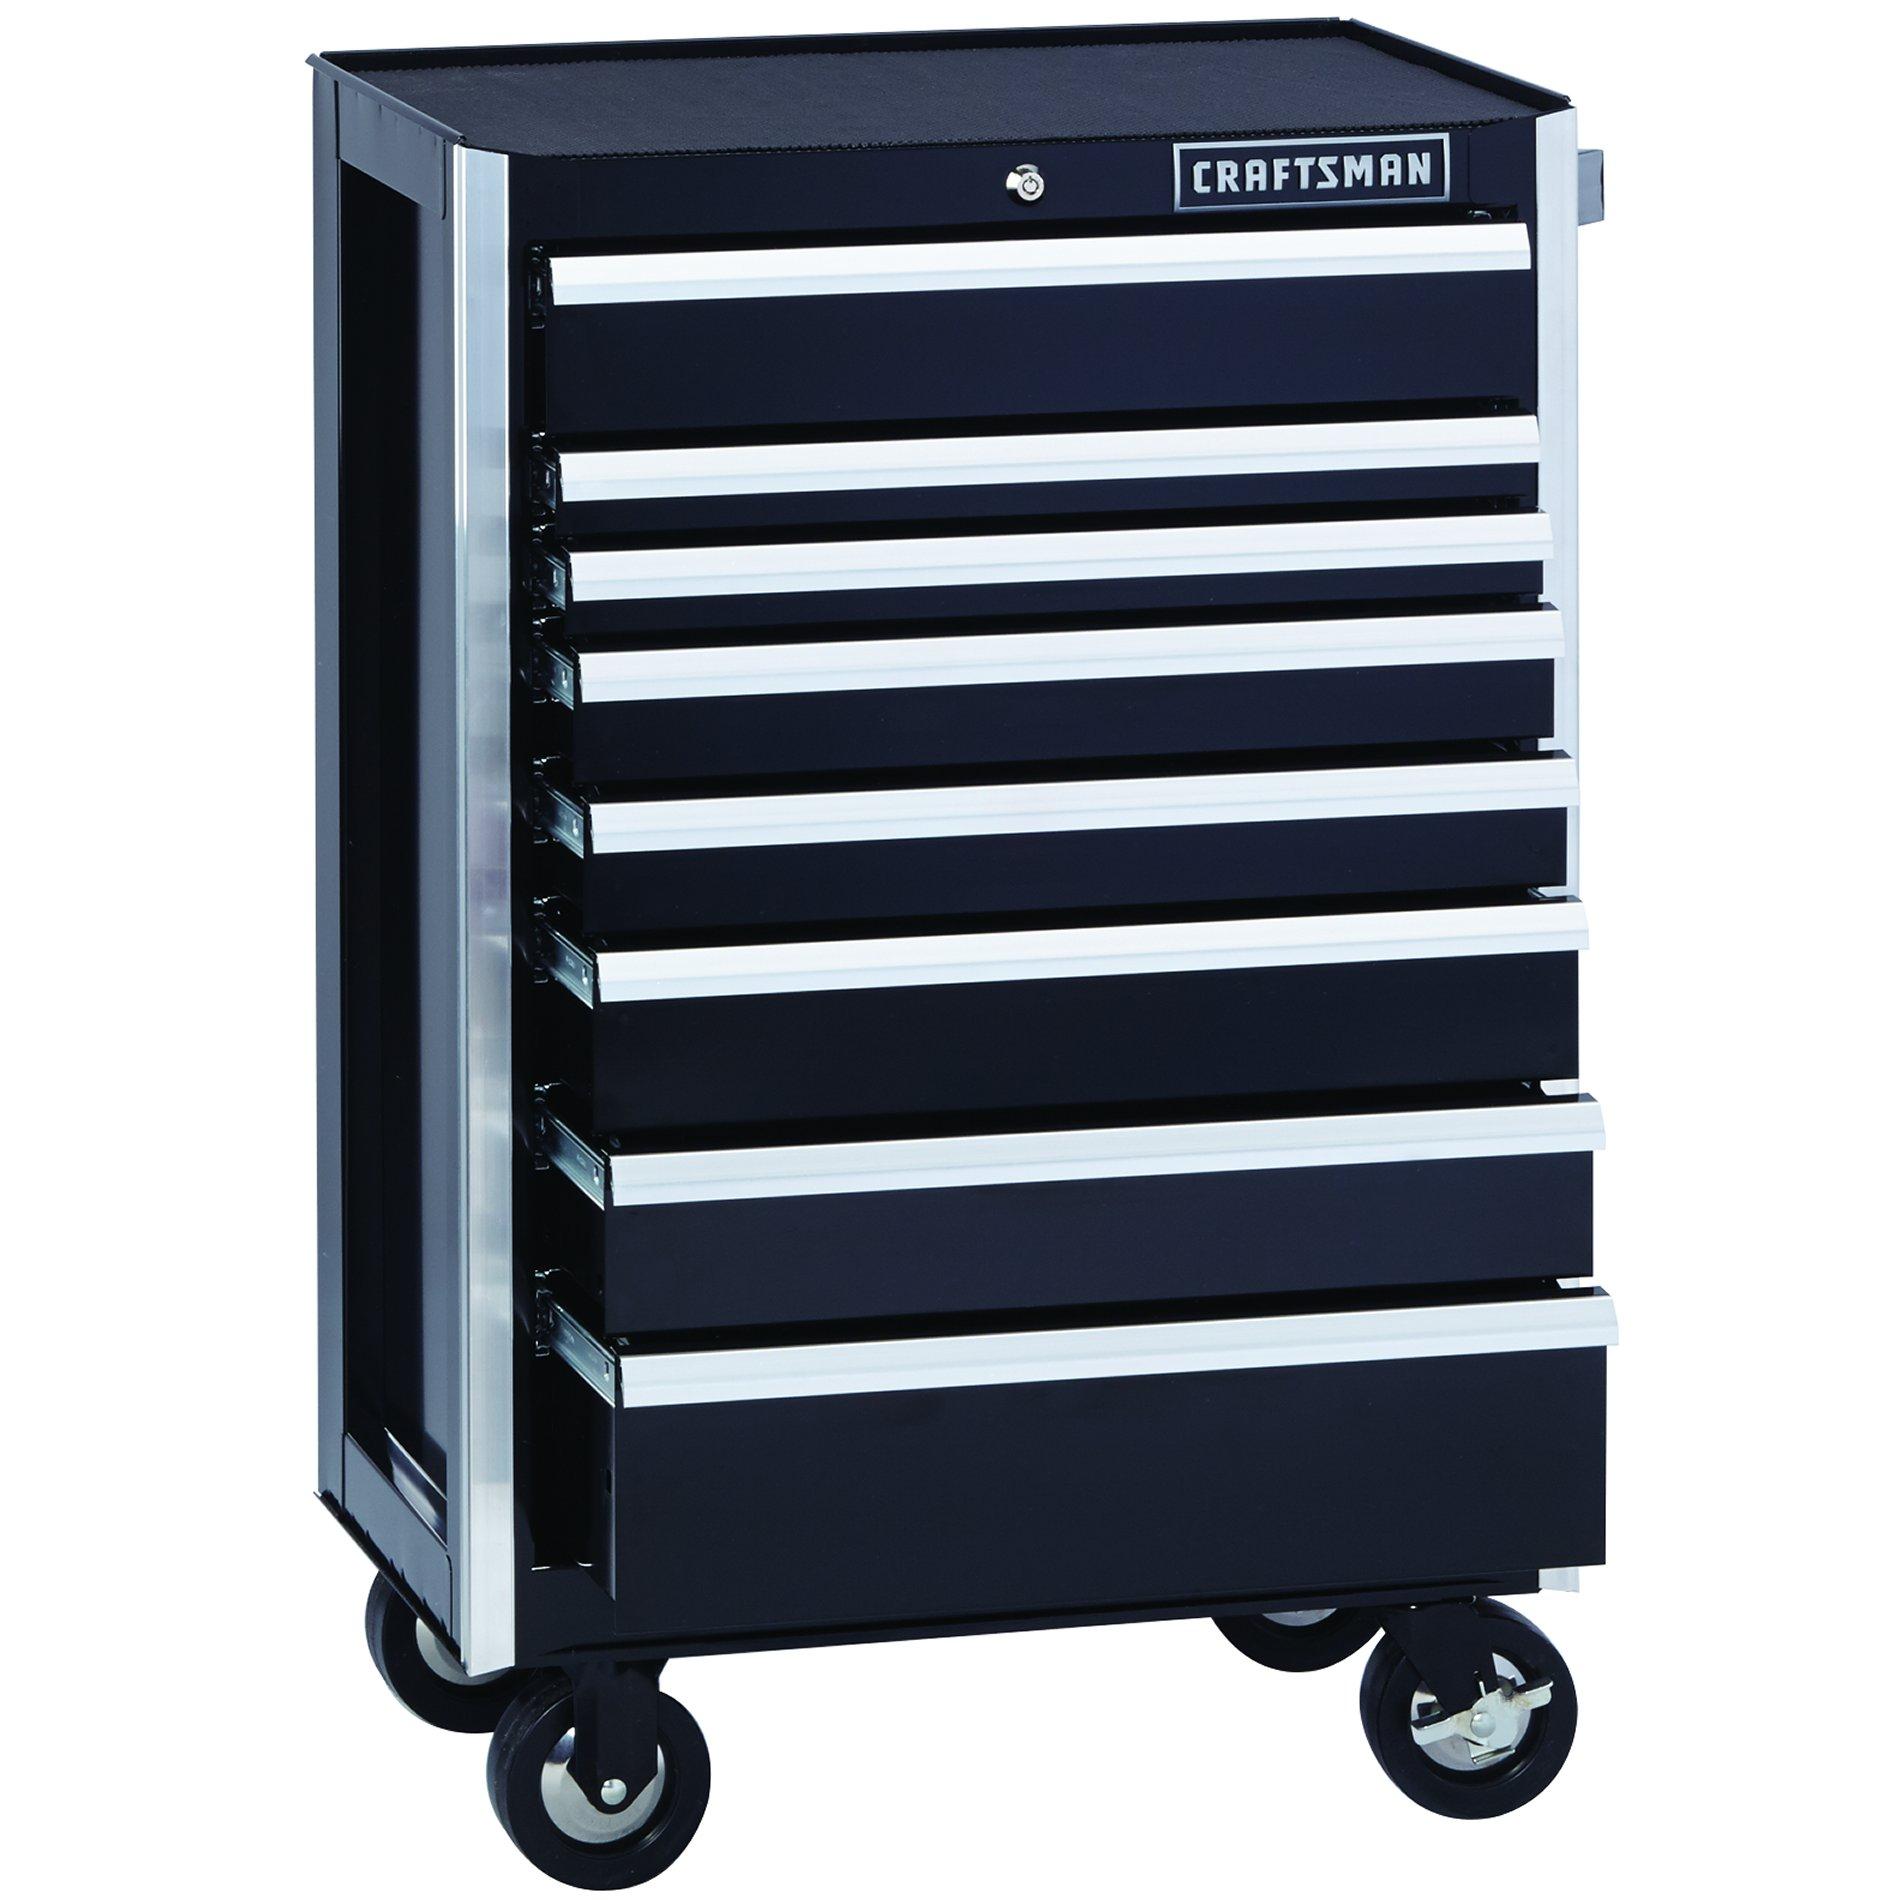 Craftsman EDGE Series 26-in. 8-Drawer Premium Heavy-Duty Ball-Bearing Rolling Cabinet - Black